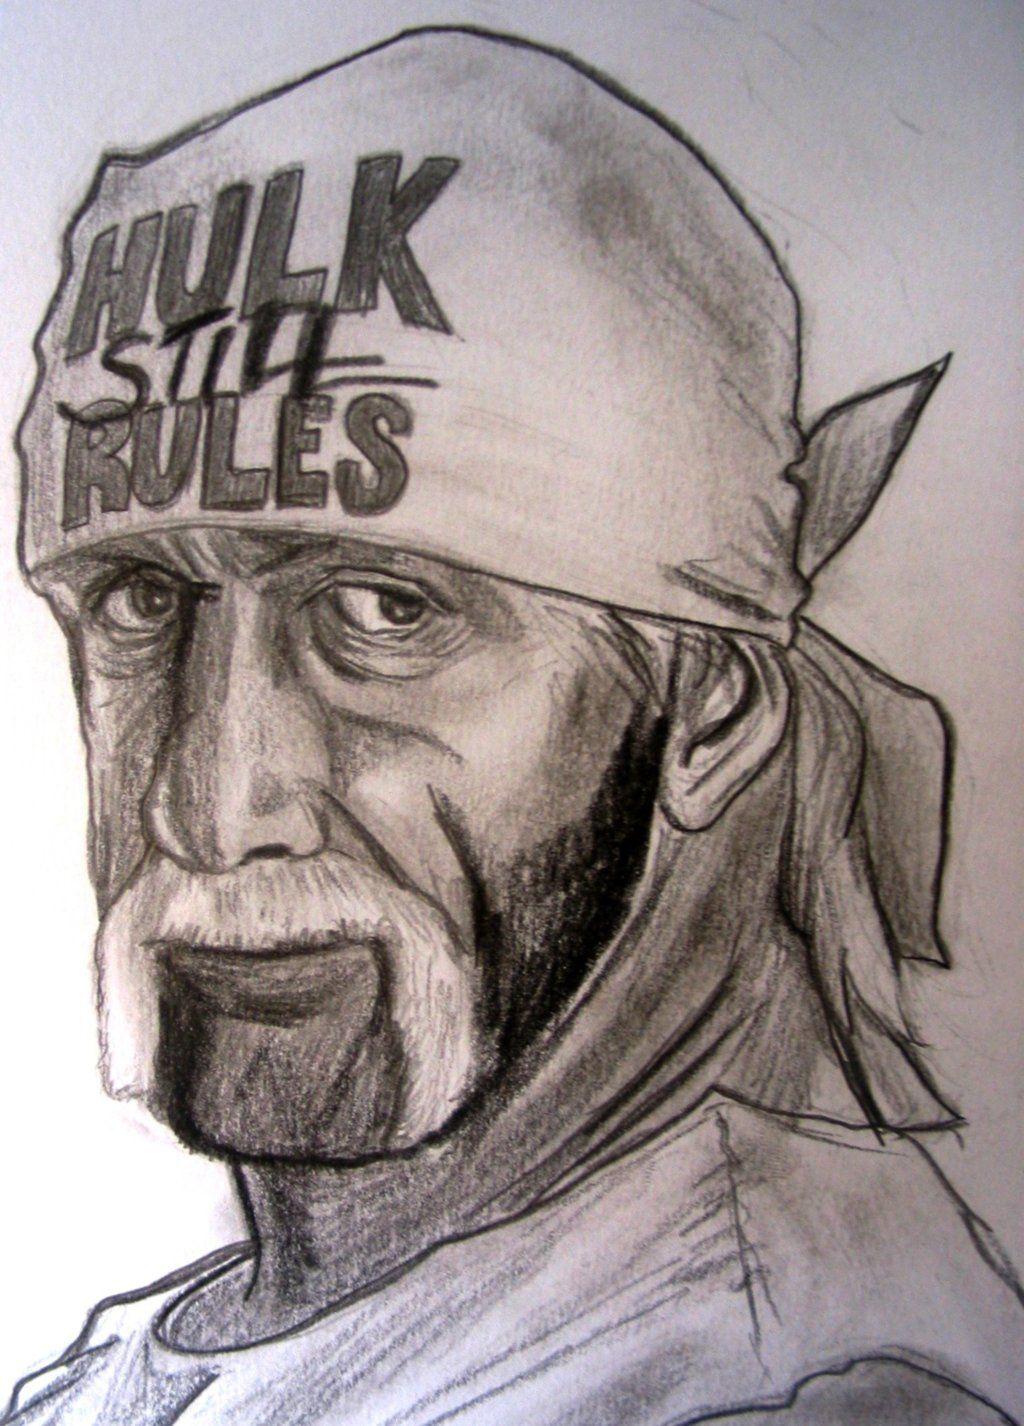 Wwe Hulk Hogan By Vinceart On Deviantart Wwe Hulk Hogan Hulk Hogan Wwe